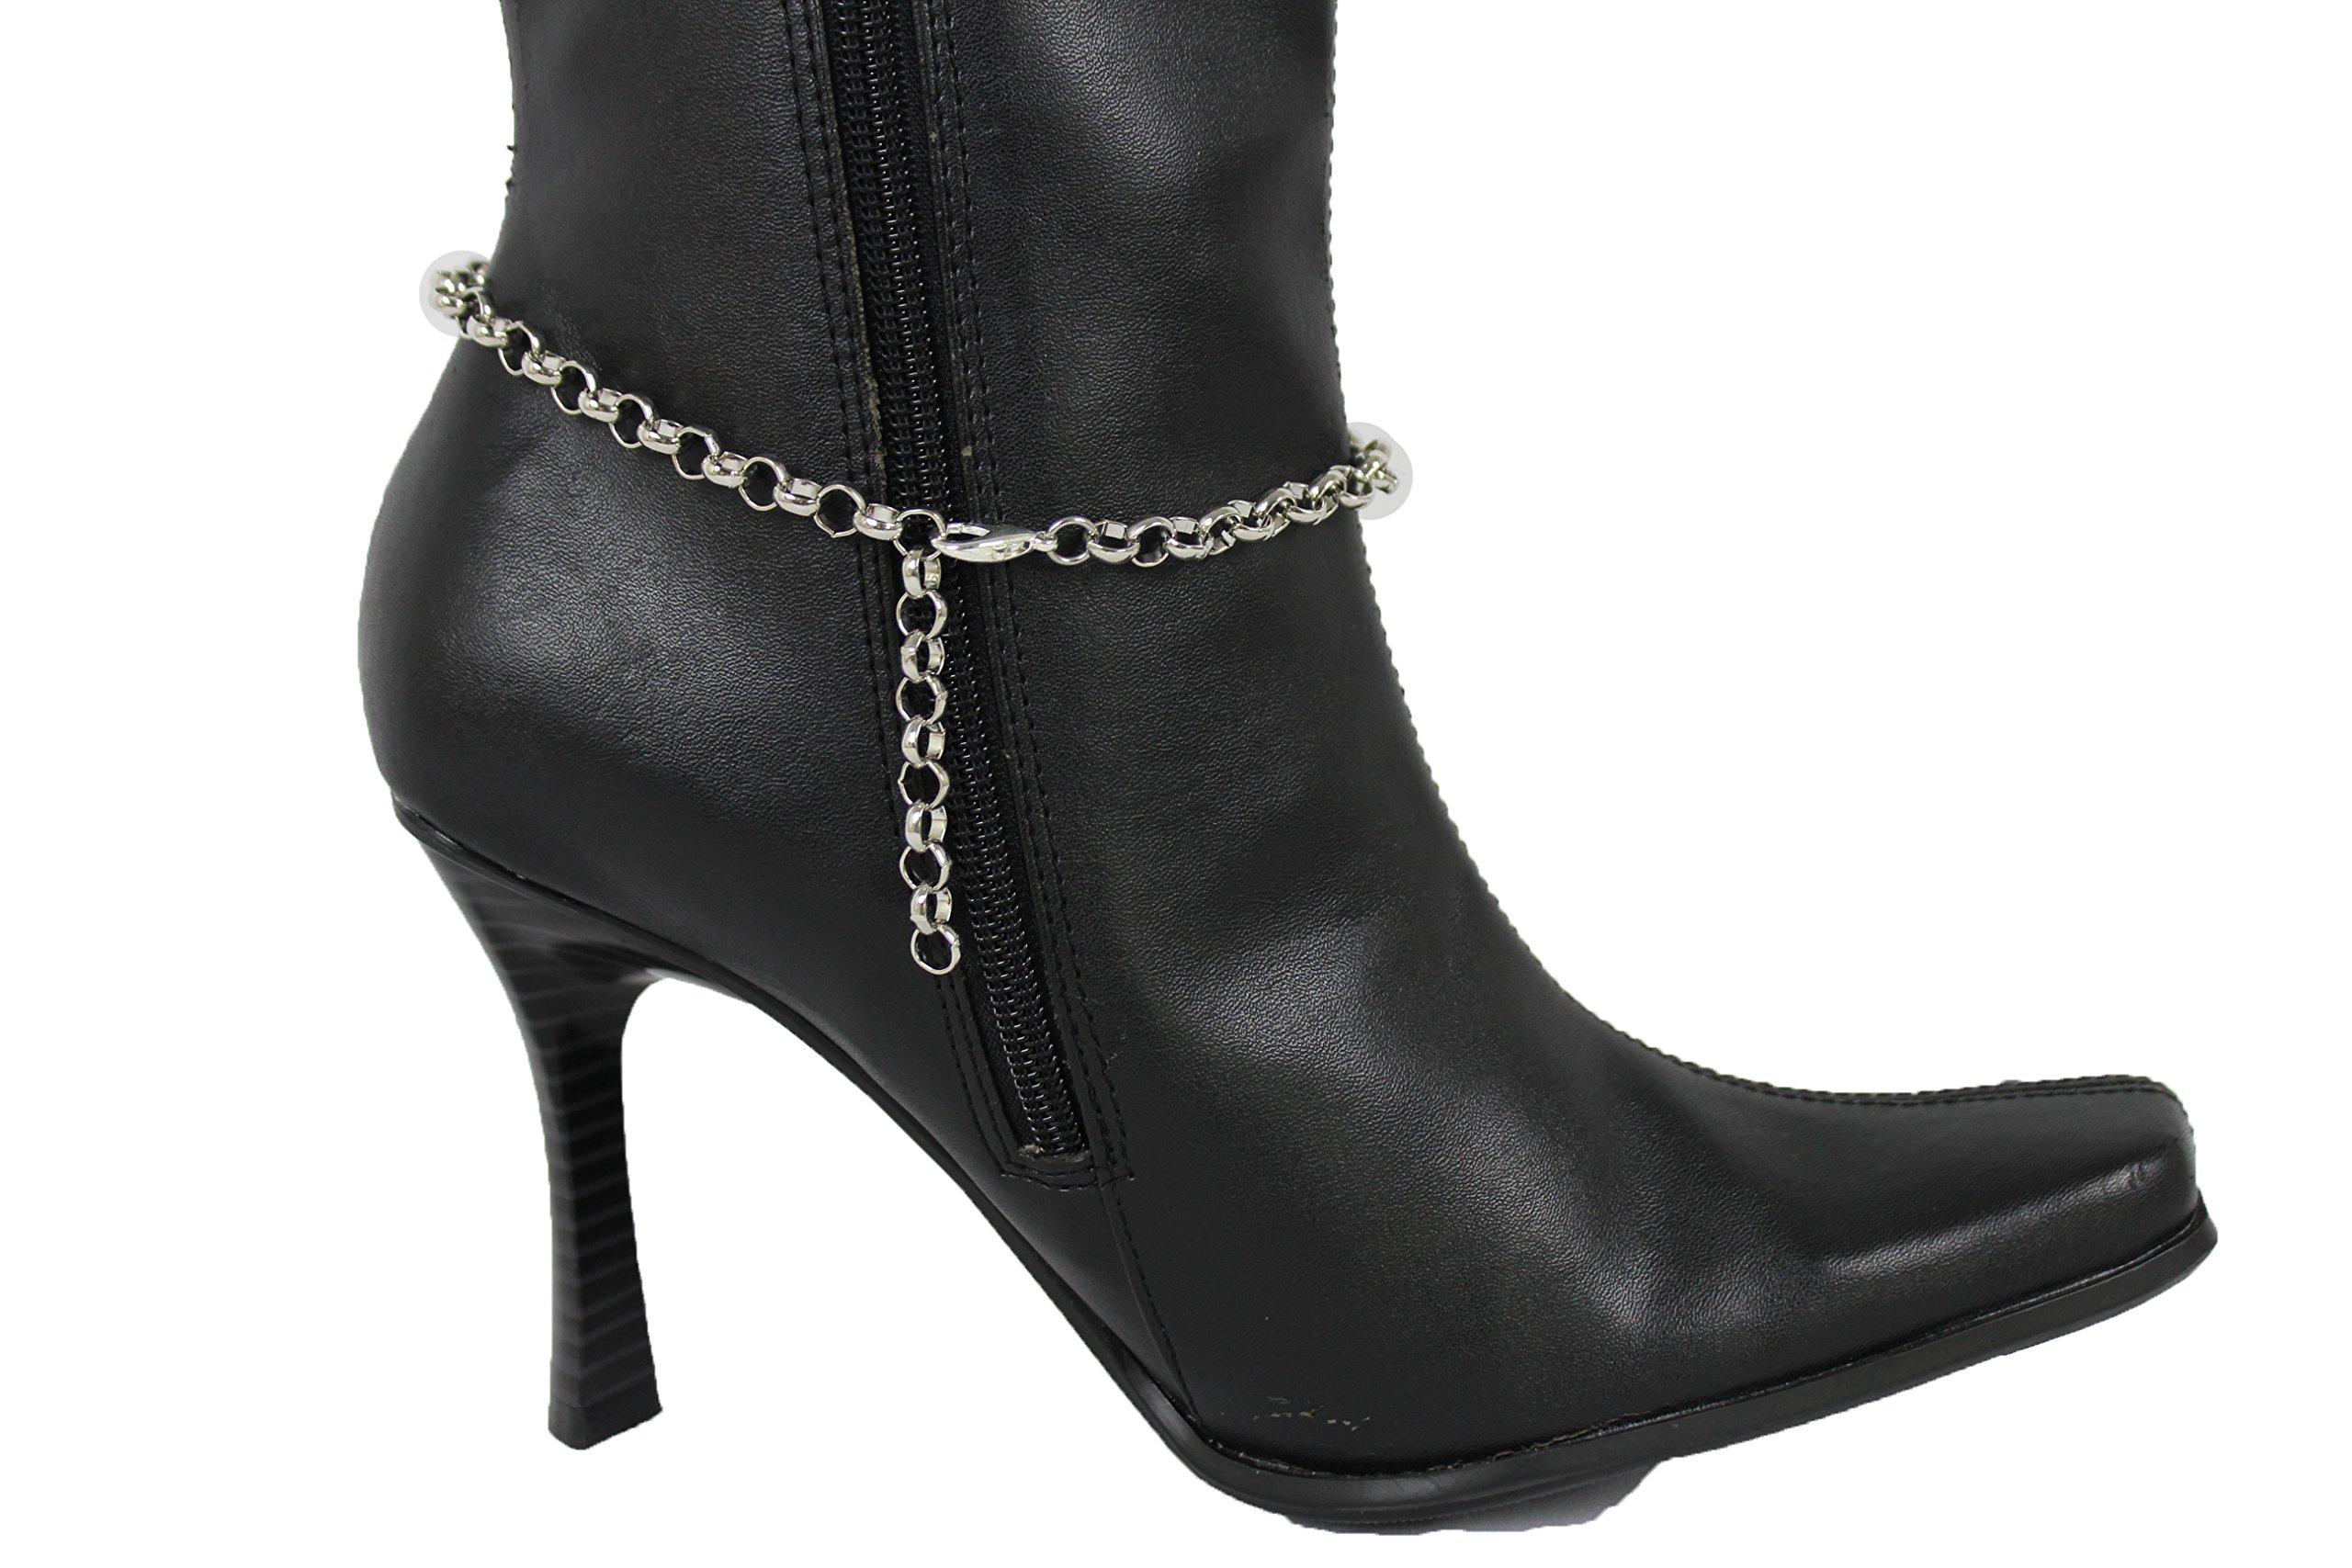 TFJ Women Western Fashion Steam Punk Jewelry Boot Bracelet Silver Metal Chain Shoe Clock Part Charm Bling